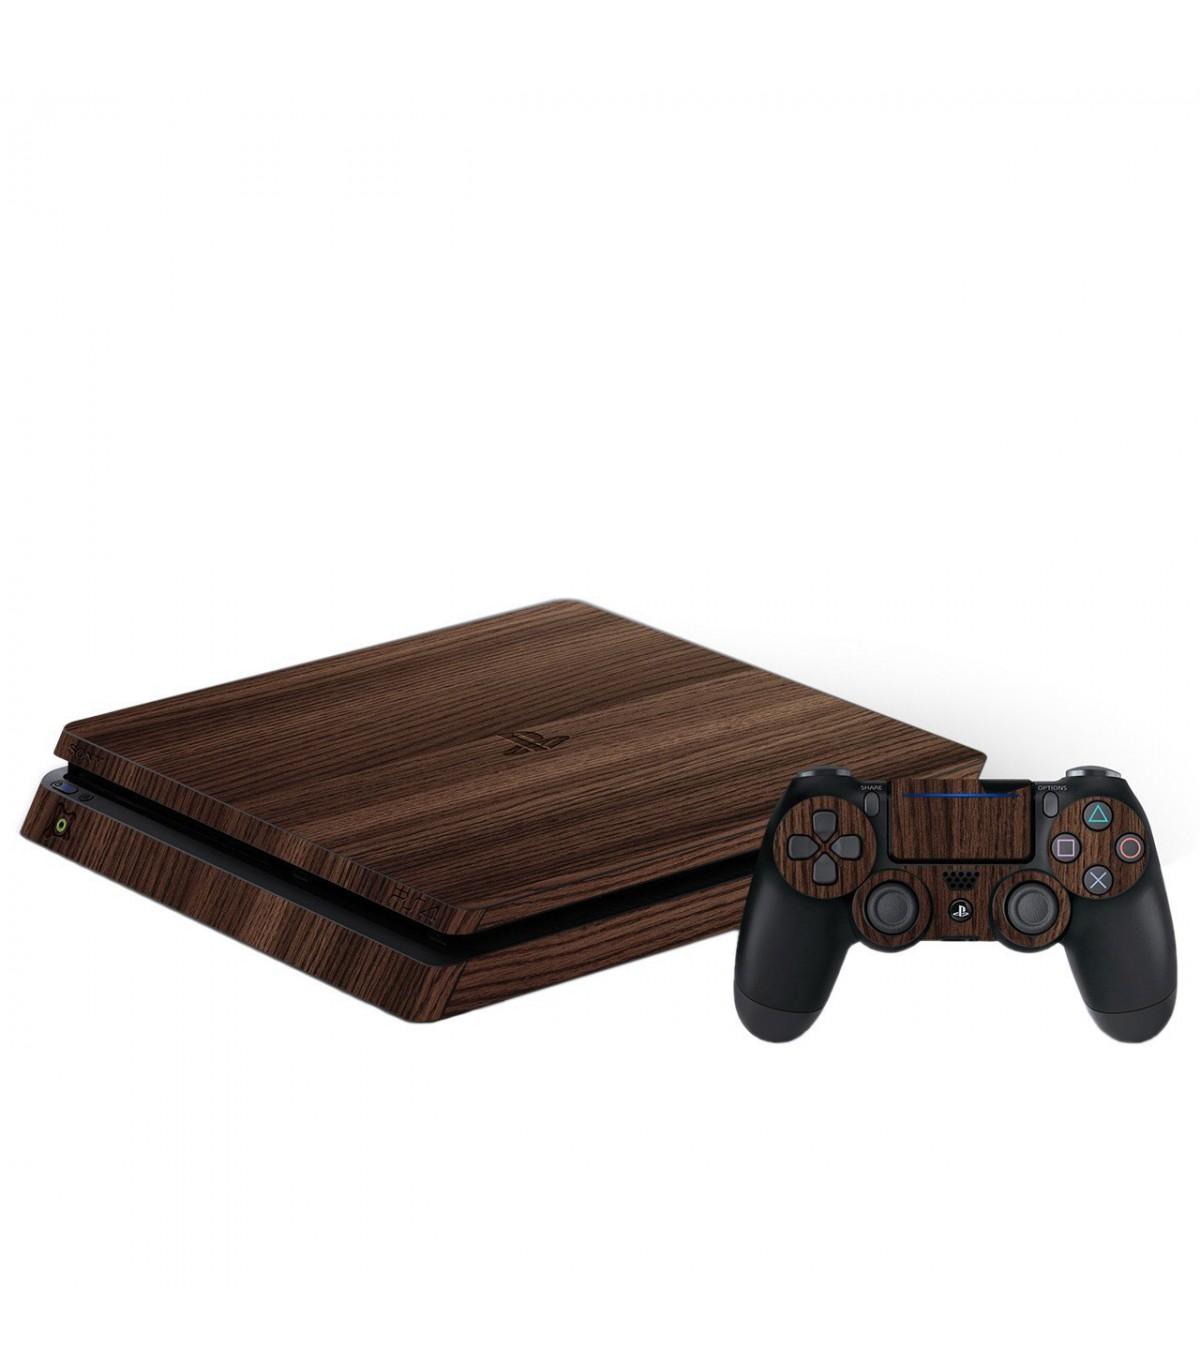 اسکین PS4 اسلیم طرح Wood